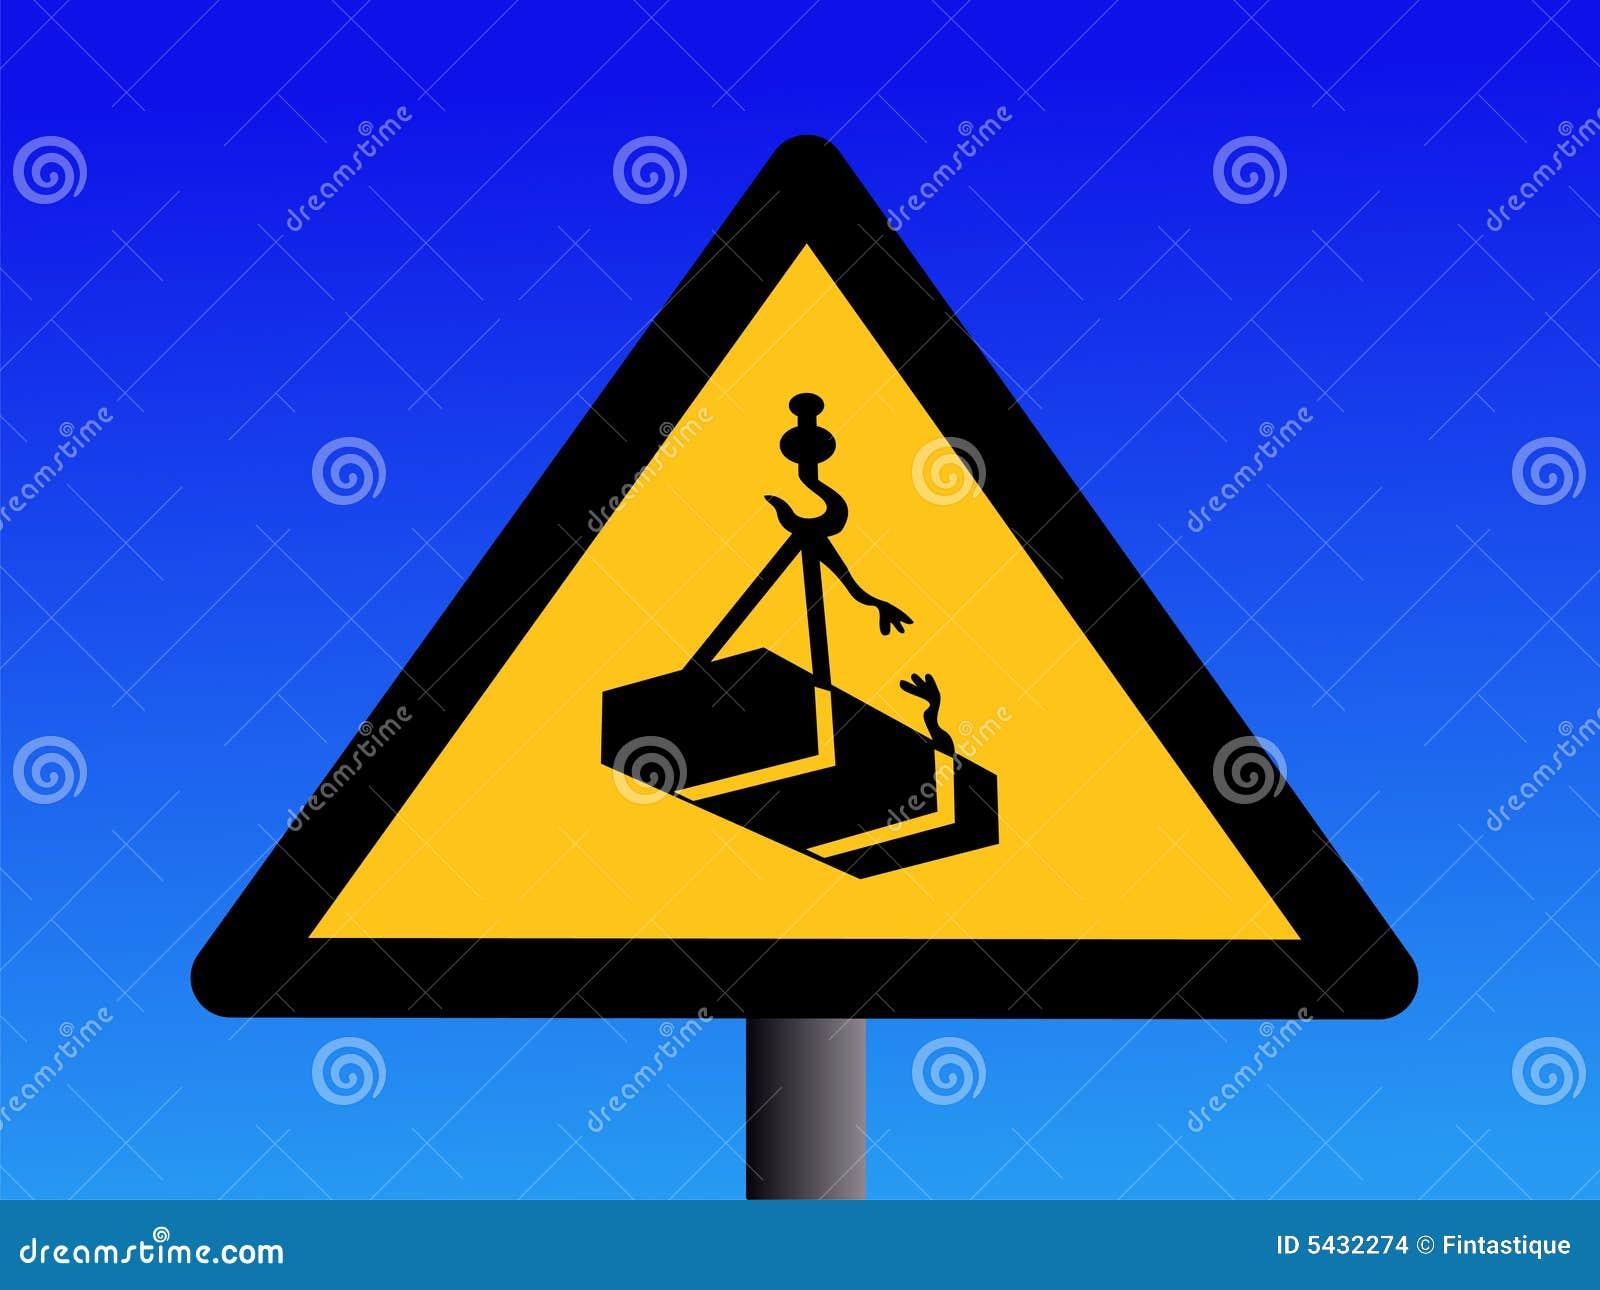 Warning Overhead Crane Loads Stock Images Image 5432274